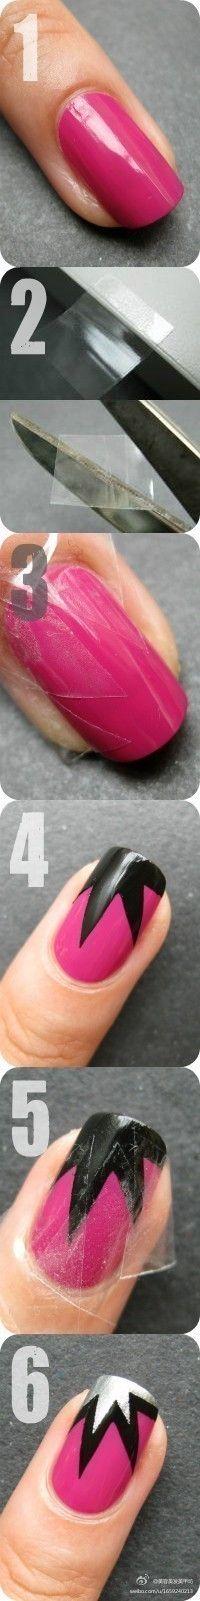 DIY nail fun!